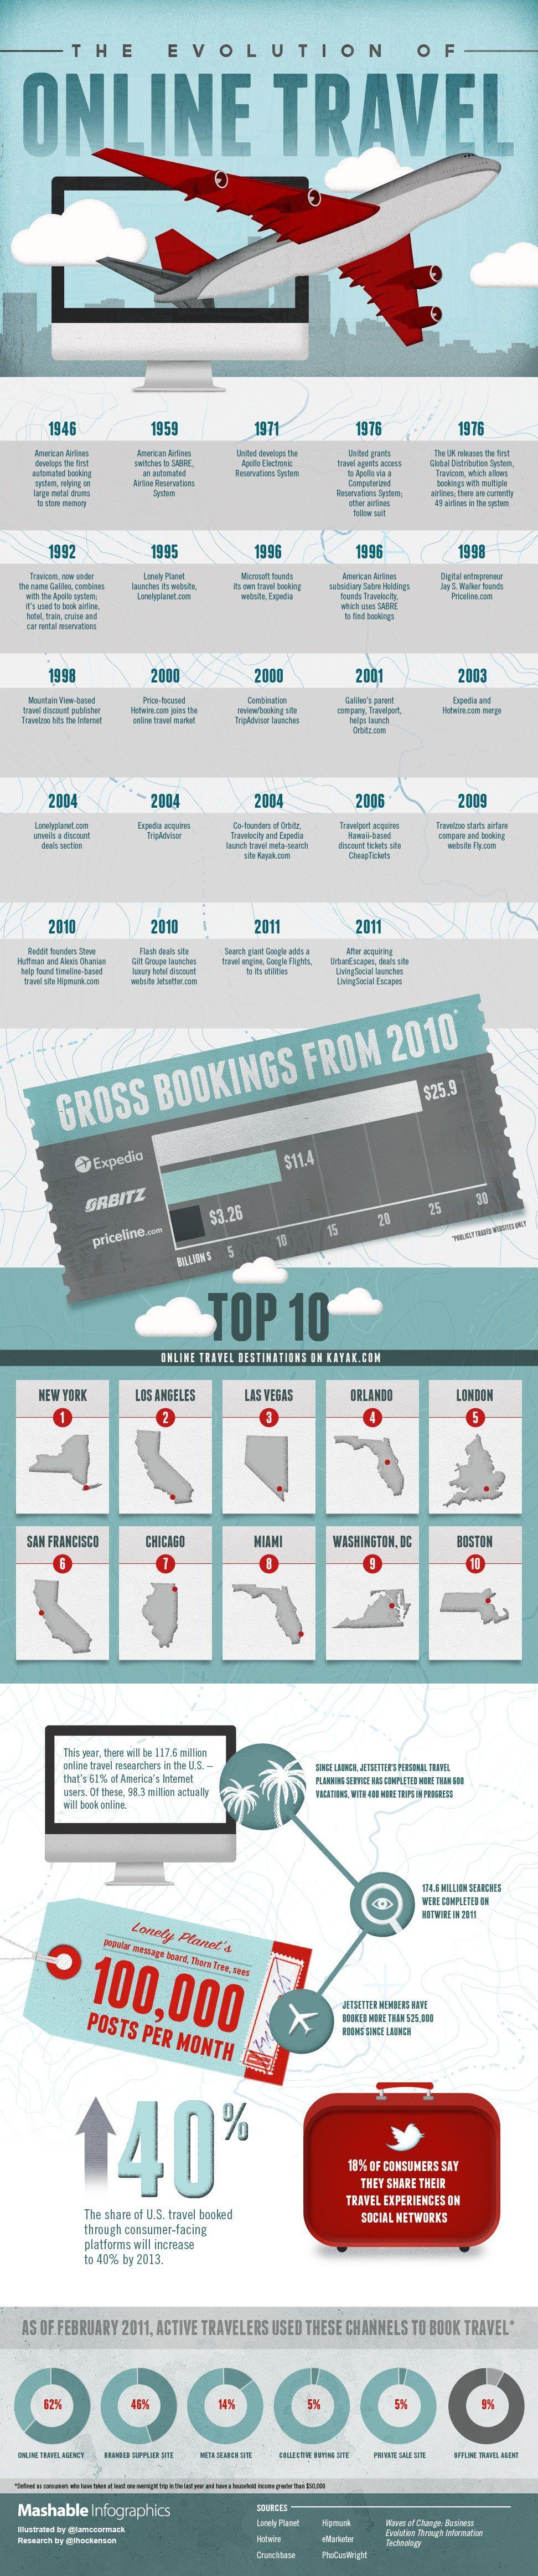 Mashable_Infographic_OnlineTravelFInal